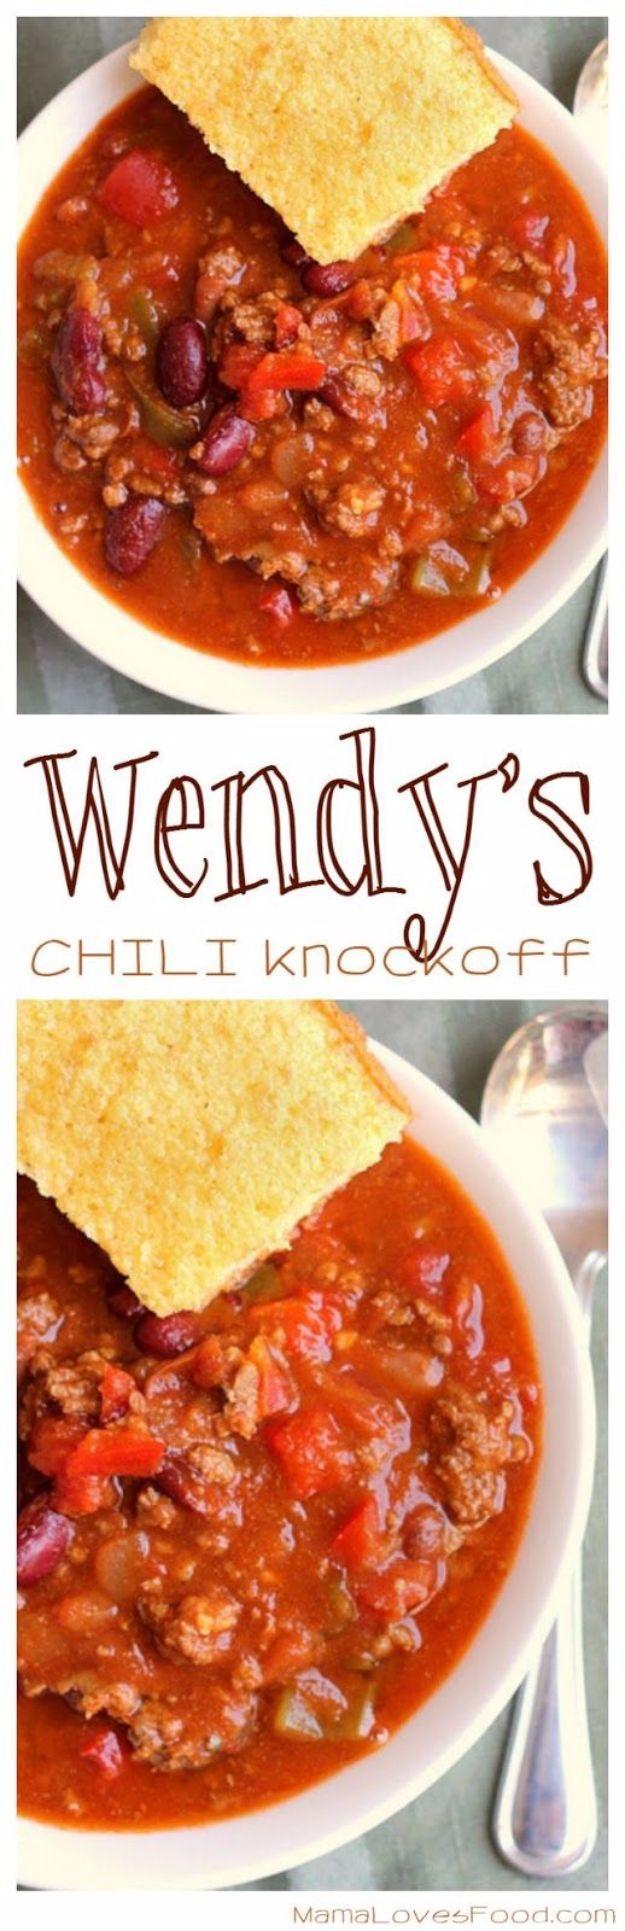 50 More Best Copycat Recipes From Top Restaurants - Wendy's Chili Knock Off - Awesome Recipe Knockoffs and Recipe Ideas from Chipotle Restaurant, Starbucks, Olive Garden, Cinabbon, Cracker Barrel, Taco Bell, Cheesecake Factory, KFC, Mc Donalds, Red Lobster, Panda Express http://diyjoy.com/best-copycat-restaurant-recipes